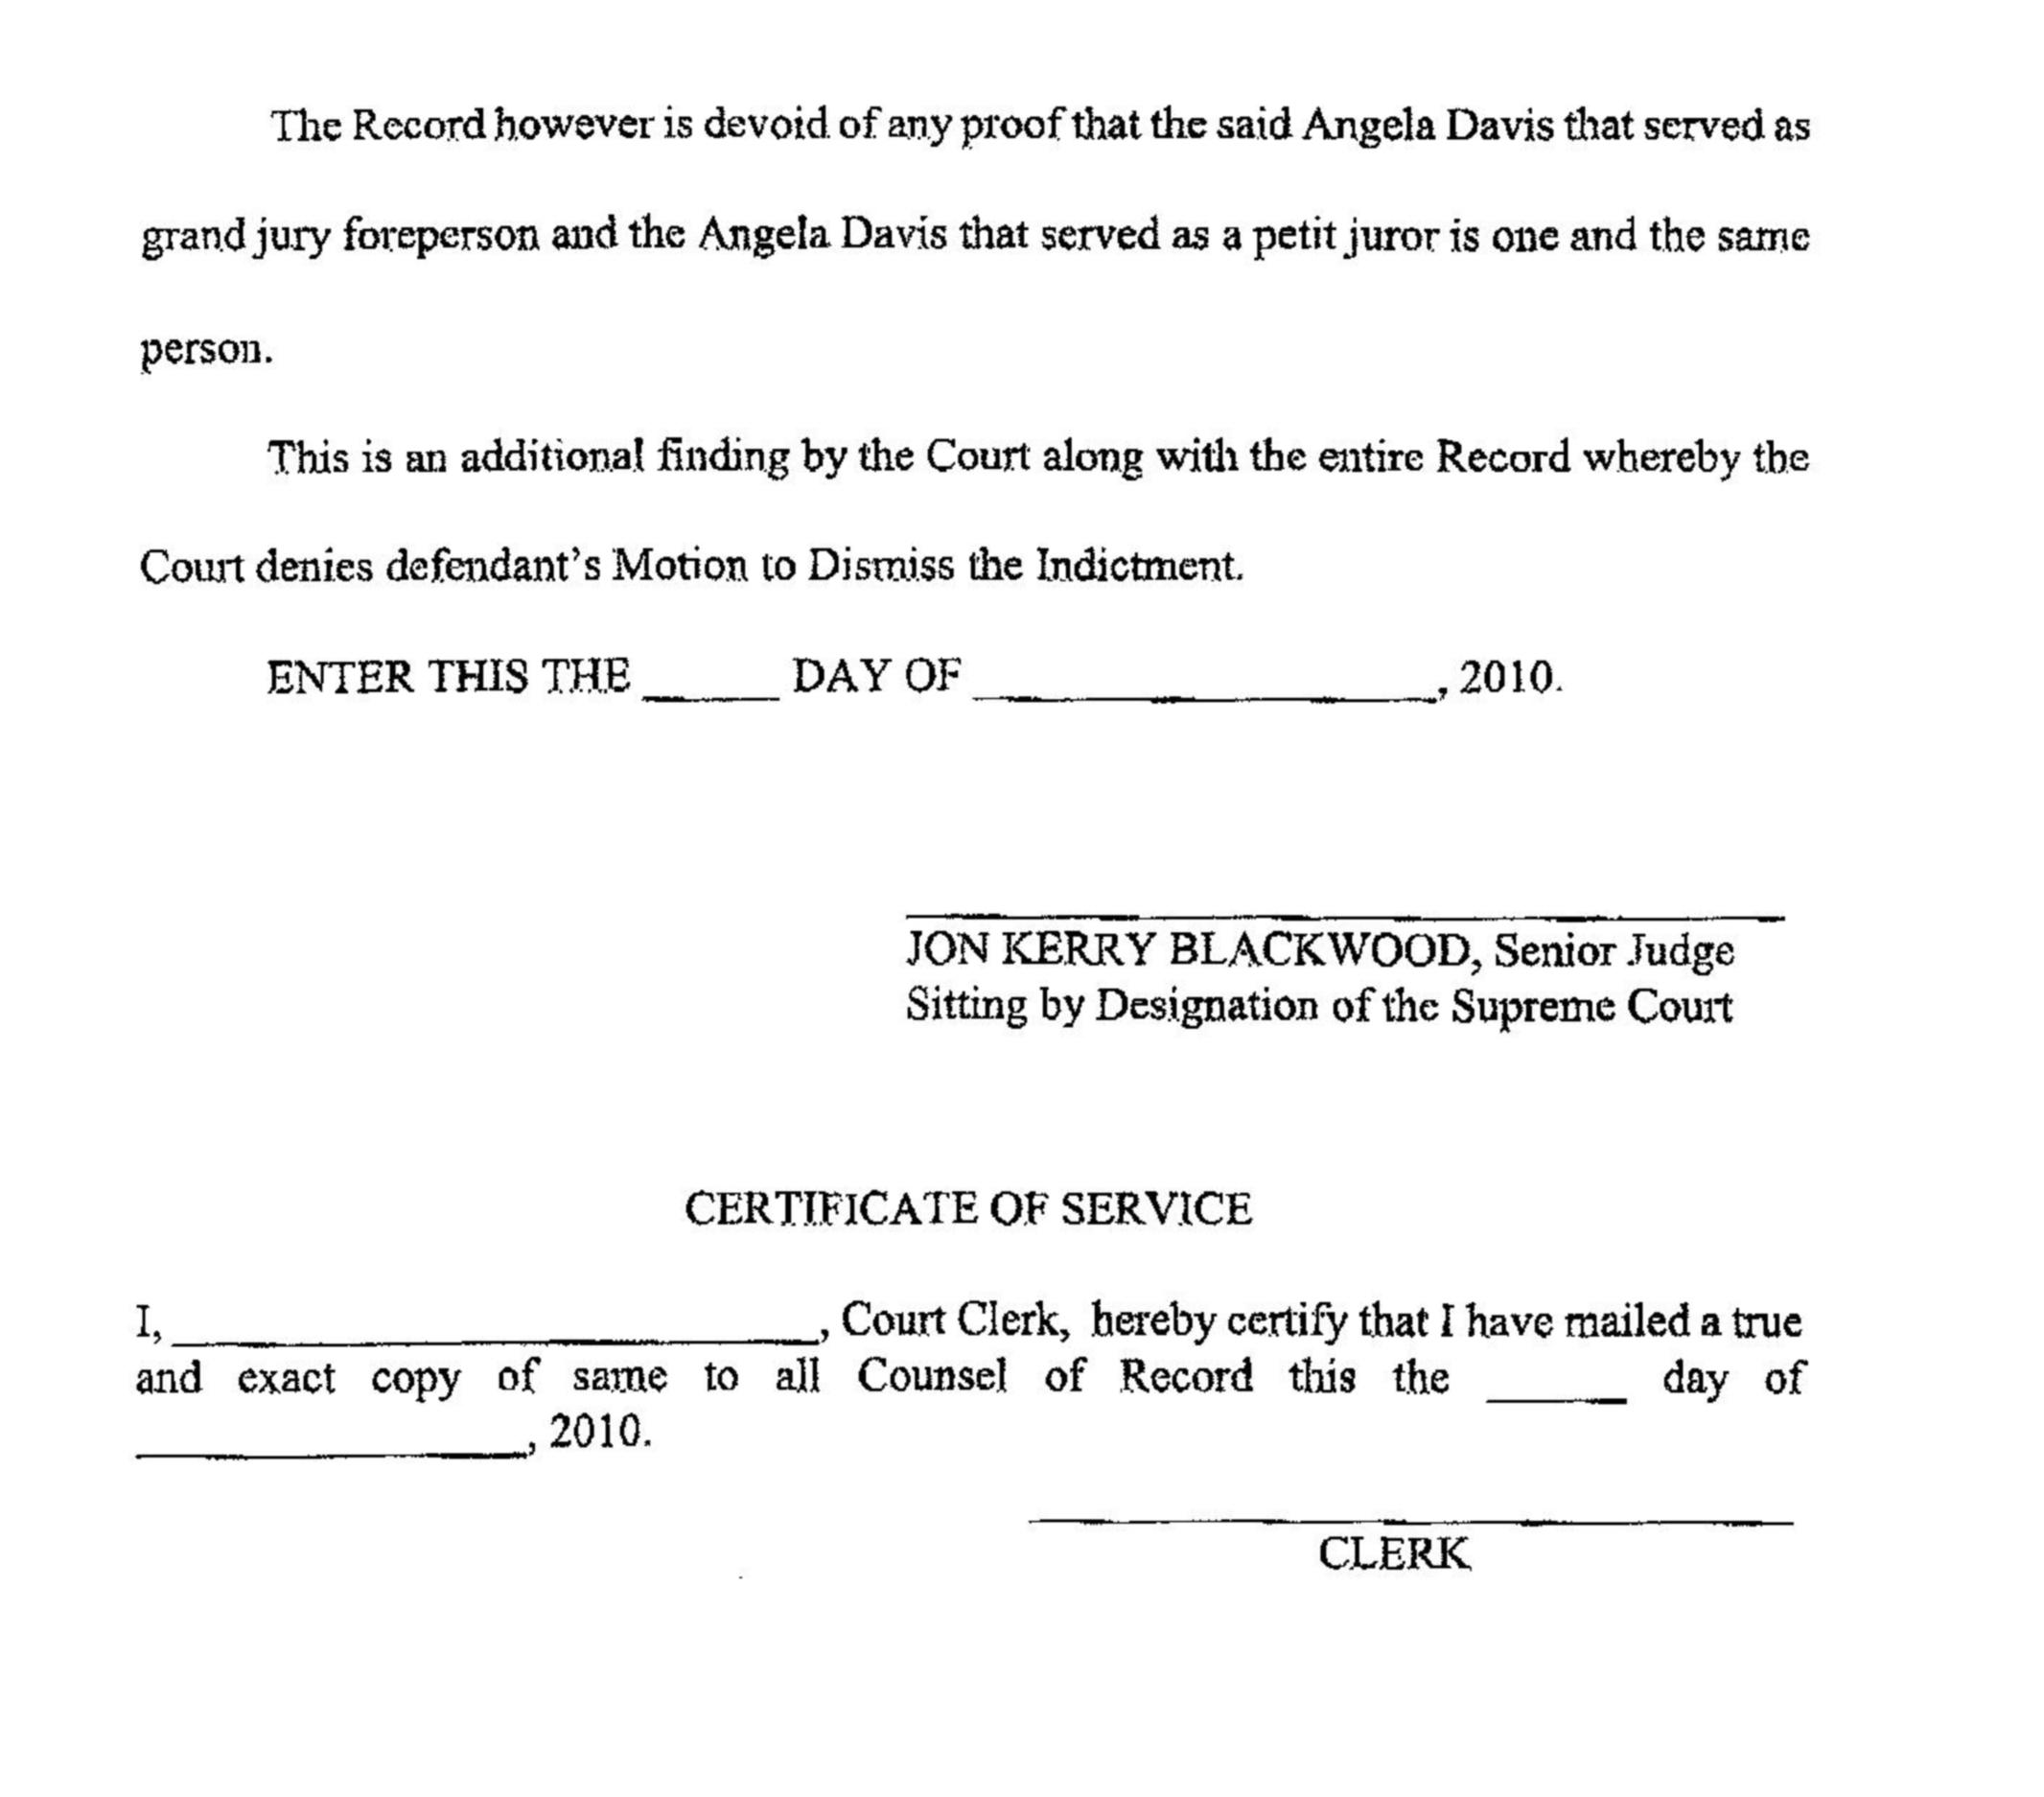 Angela Davis service page 2 Enlargement